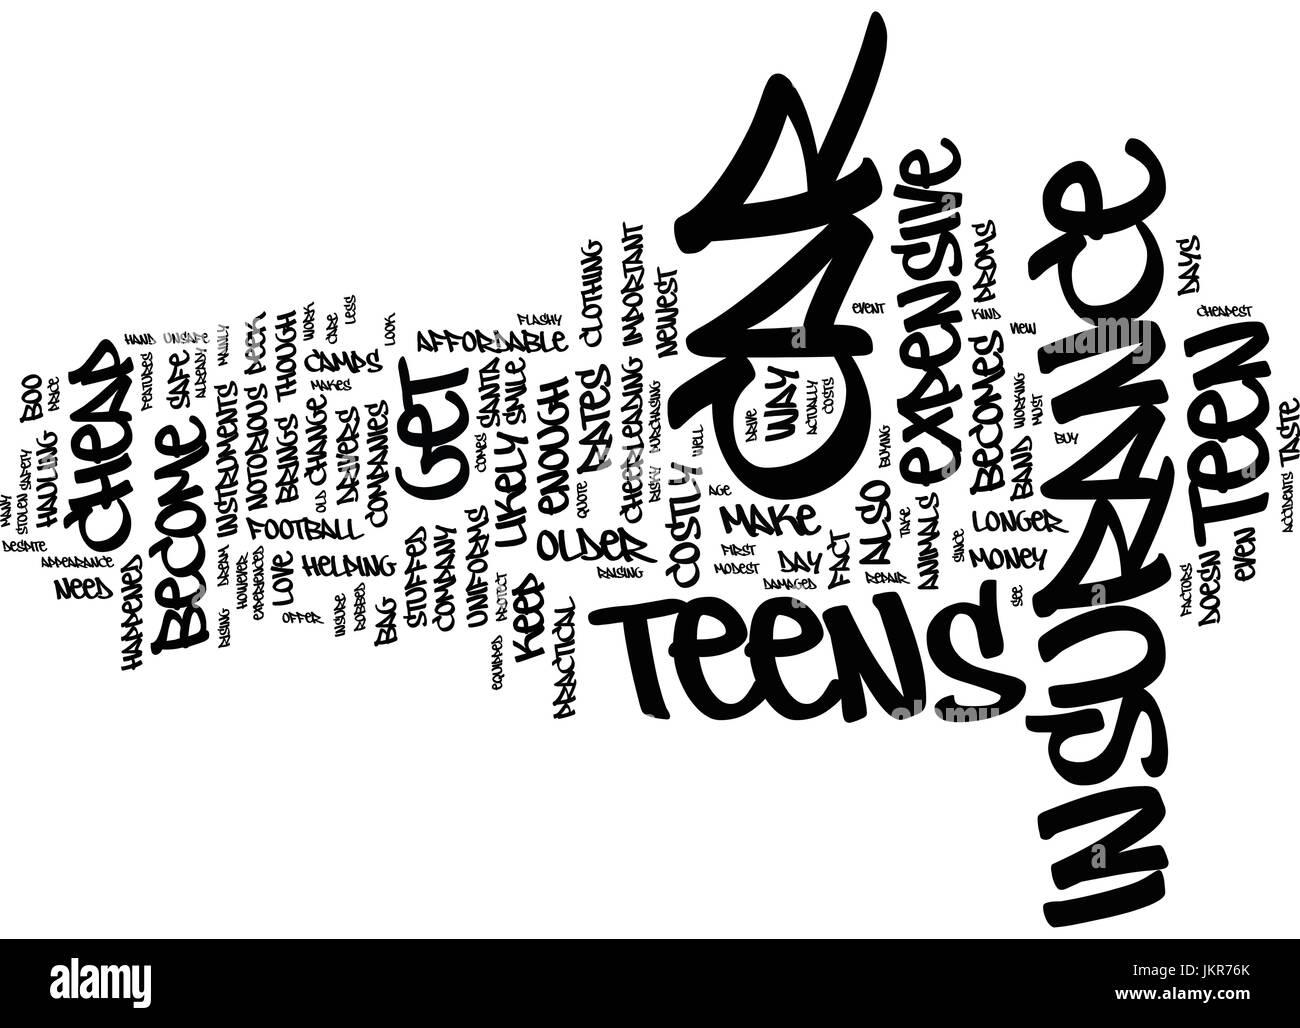 Cheap Car Insurance For Teens >> The Cheapest Car Insurance For Teens Keep The Rates Down